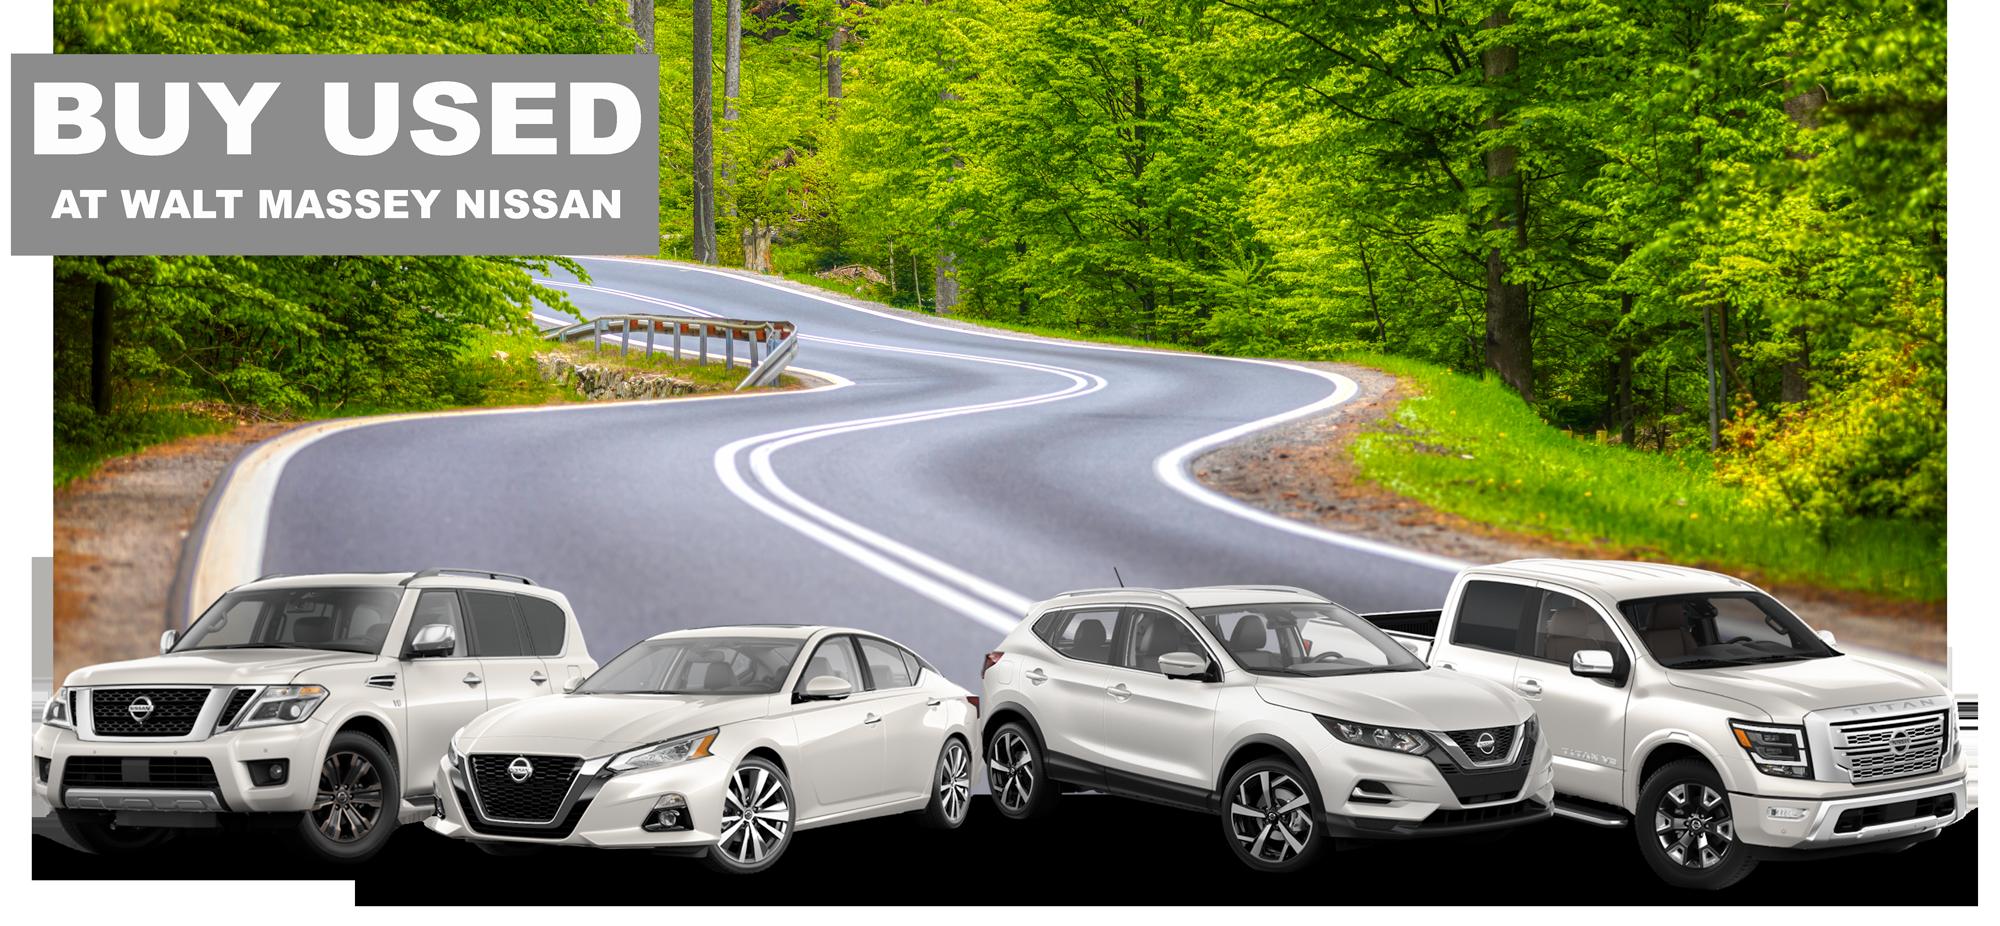 Nissan Lineup in Opp, AL